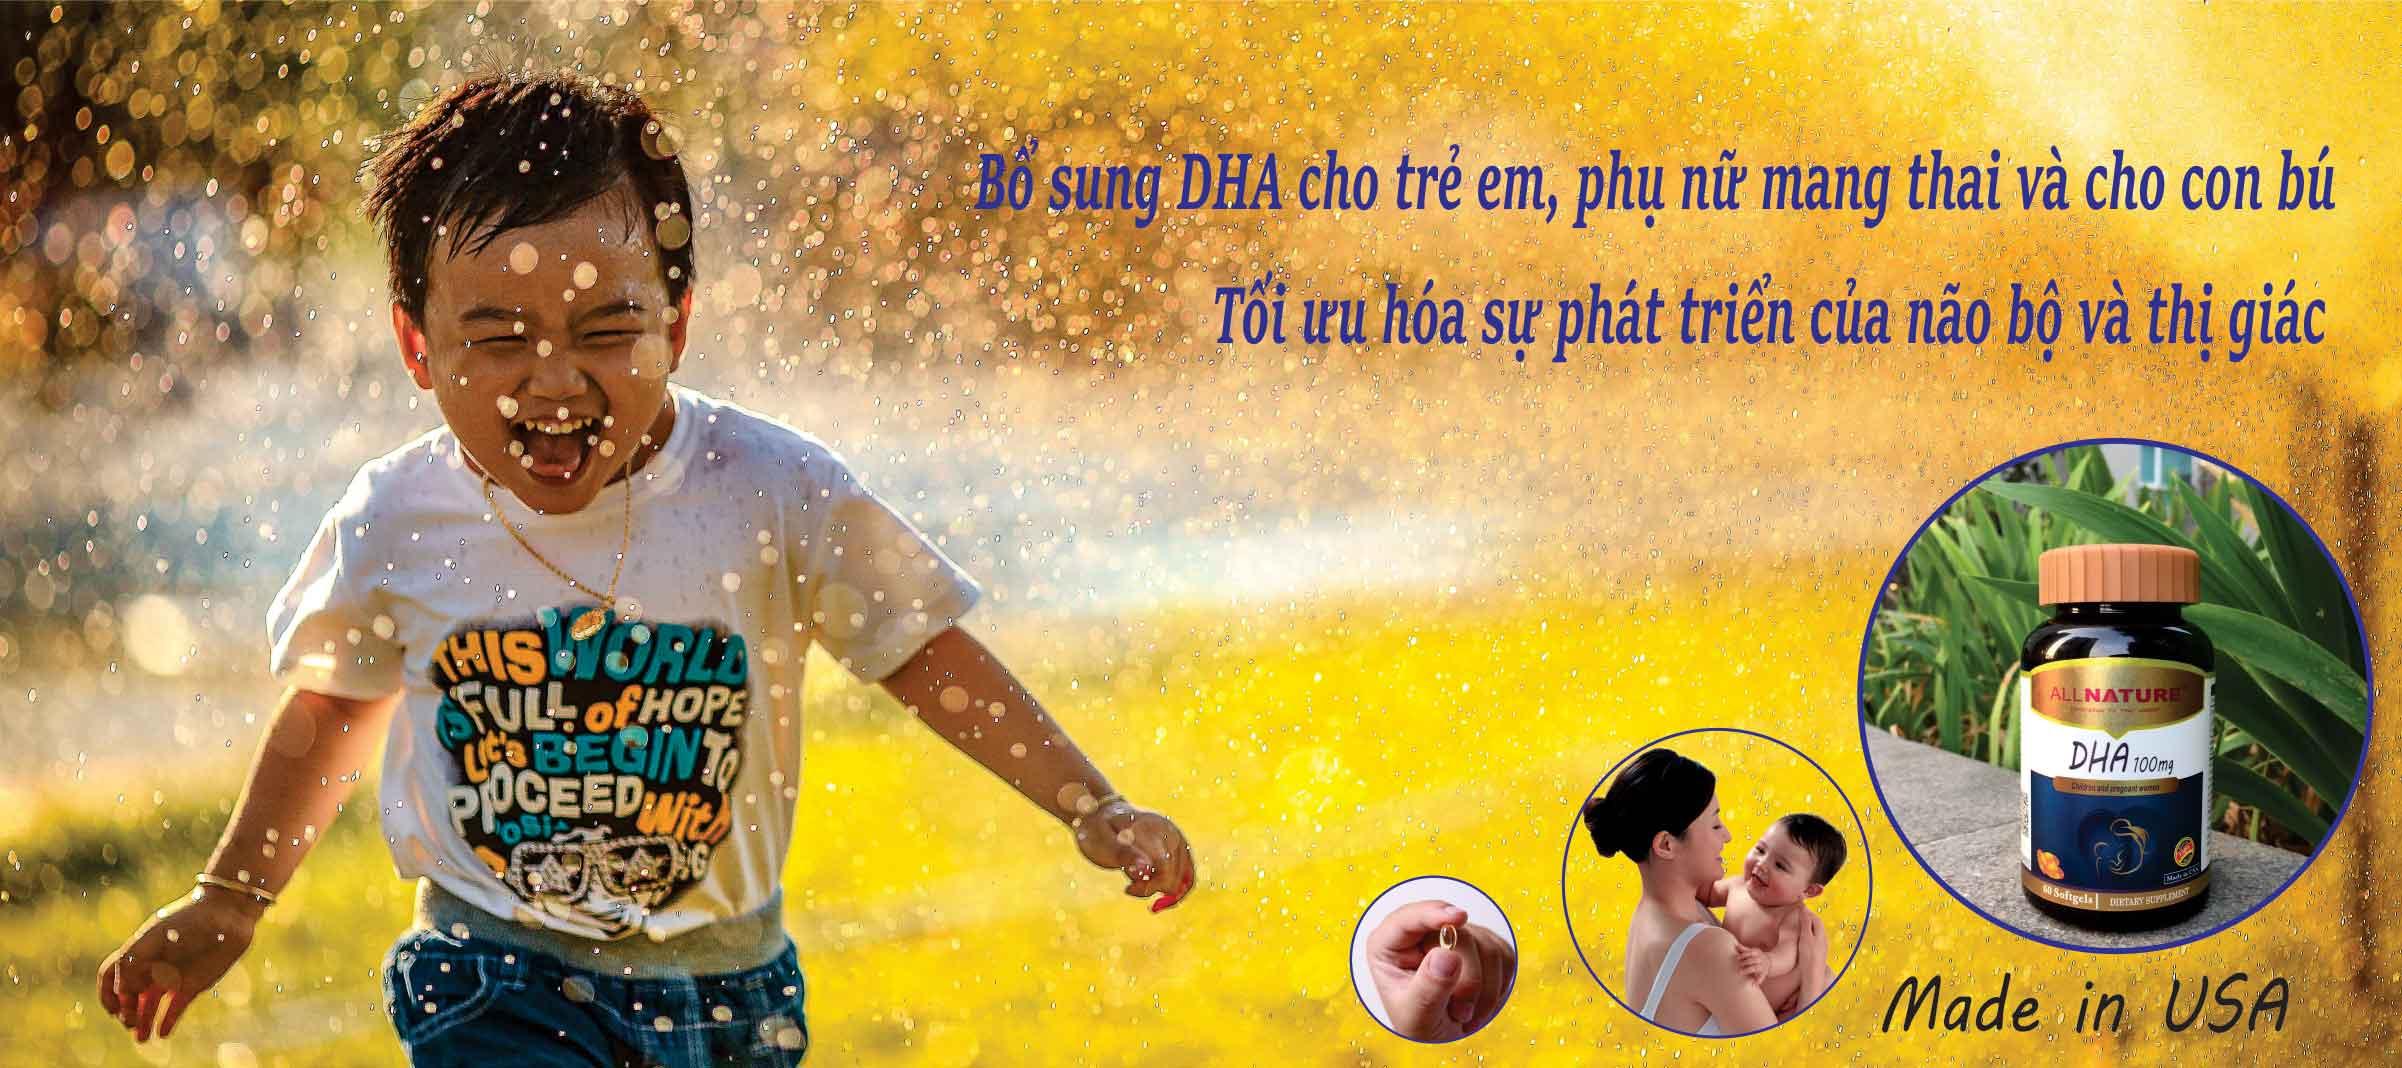 http://www.rosix.com.vn/tp-bao-ve-suc-khoe-dha-100-mg-bo-sung-dha-cho-tre-em-phu-nu-co-thai-va-cho-c